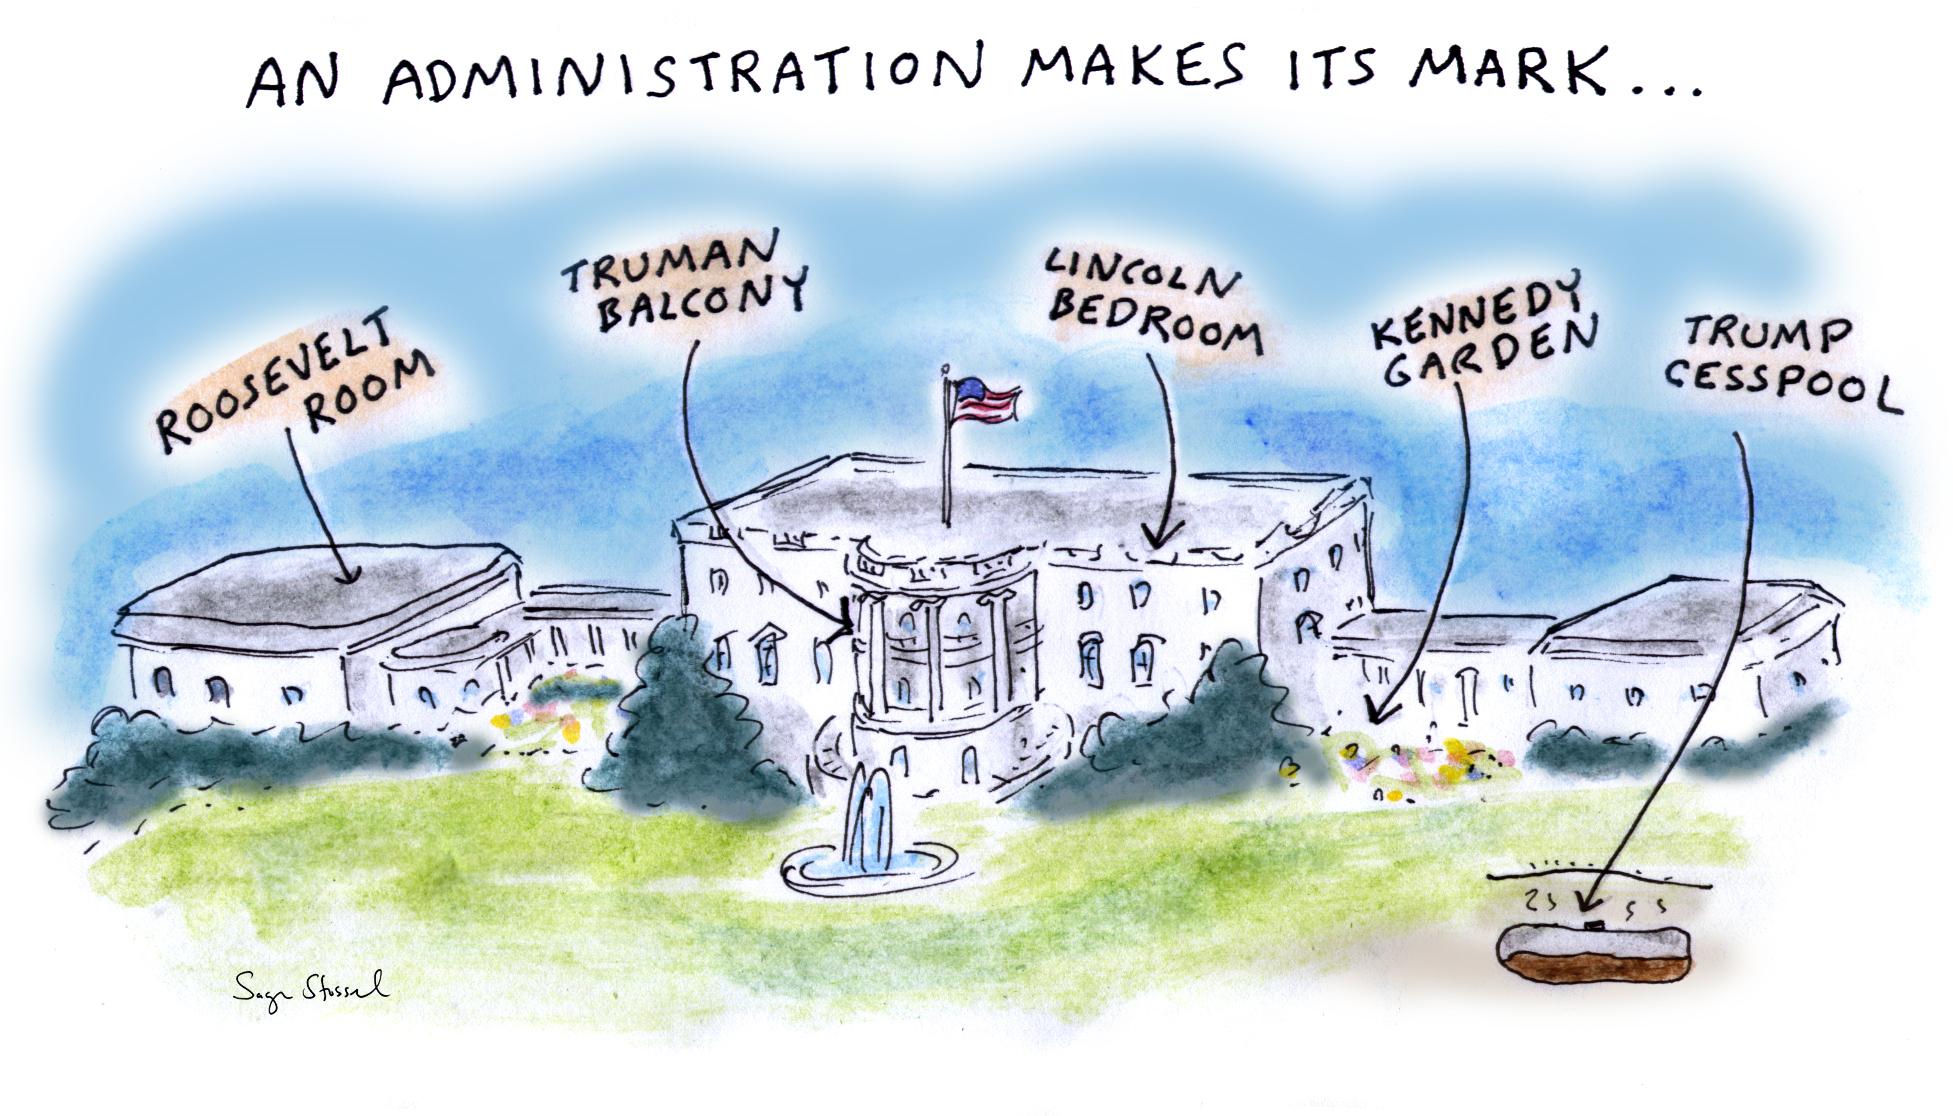 trump, white house, omarosa, lies, racism, corruption, vipers nest, cesspool, self-dealing, emoluments, cohen, manafort, roger stone, scott pruitt, wilber ross, sage stossel